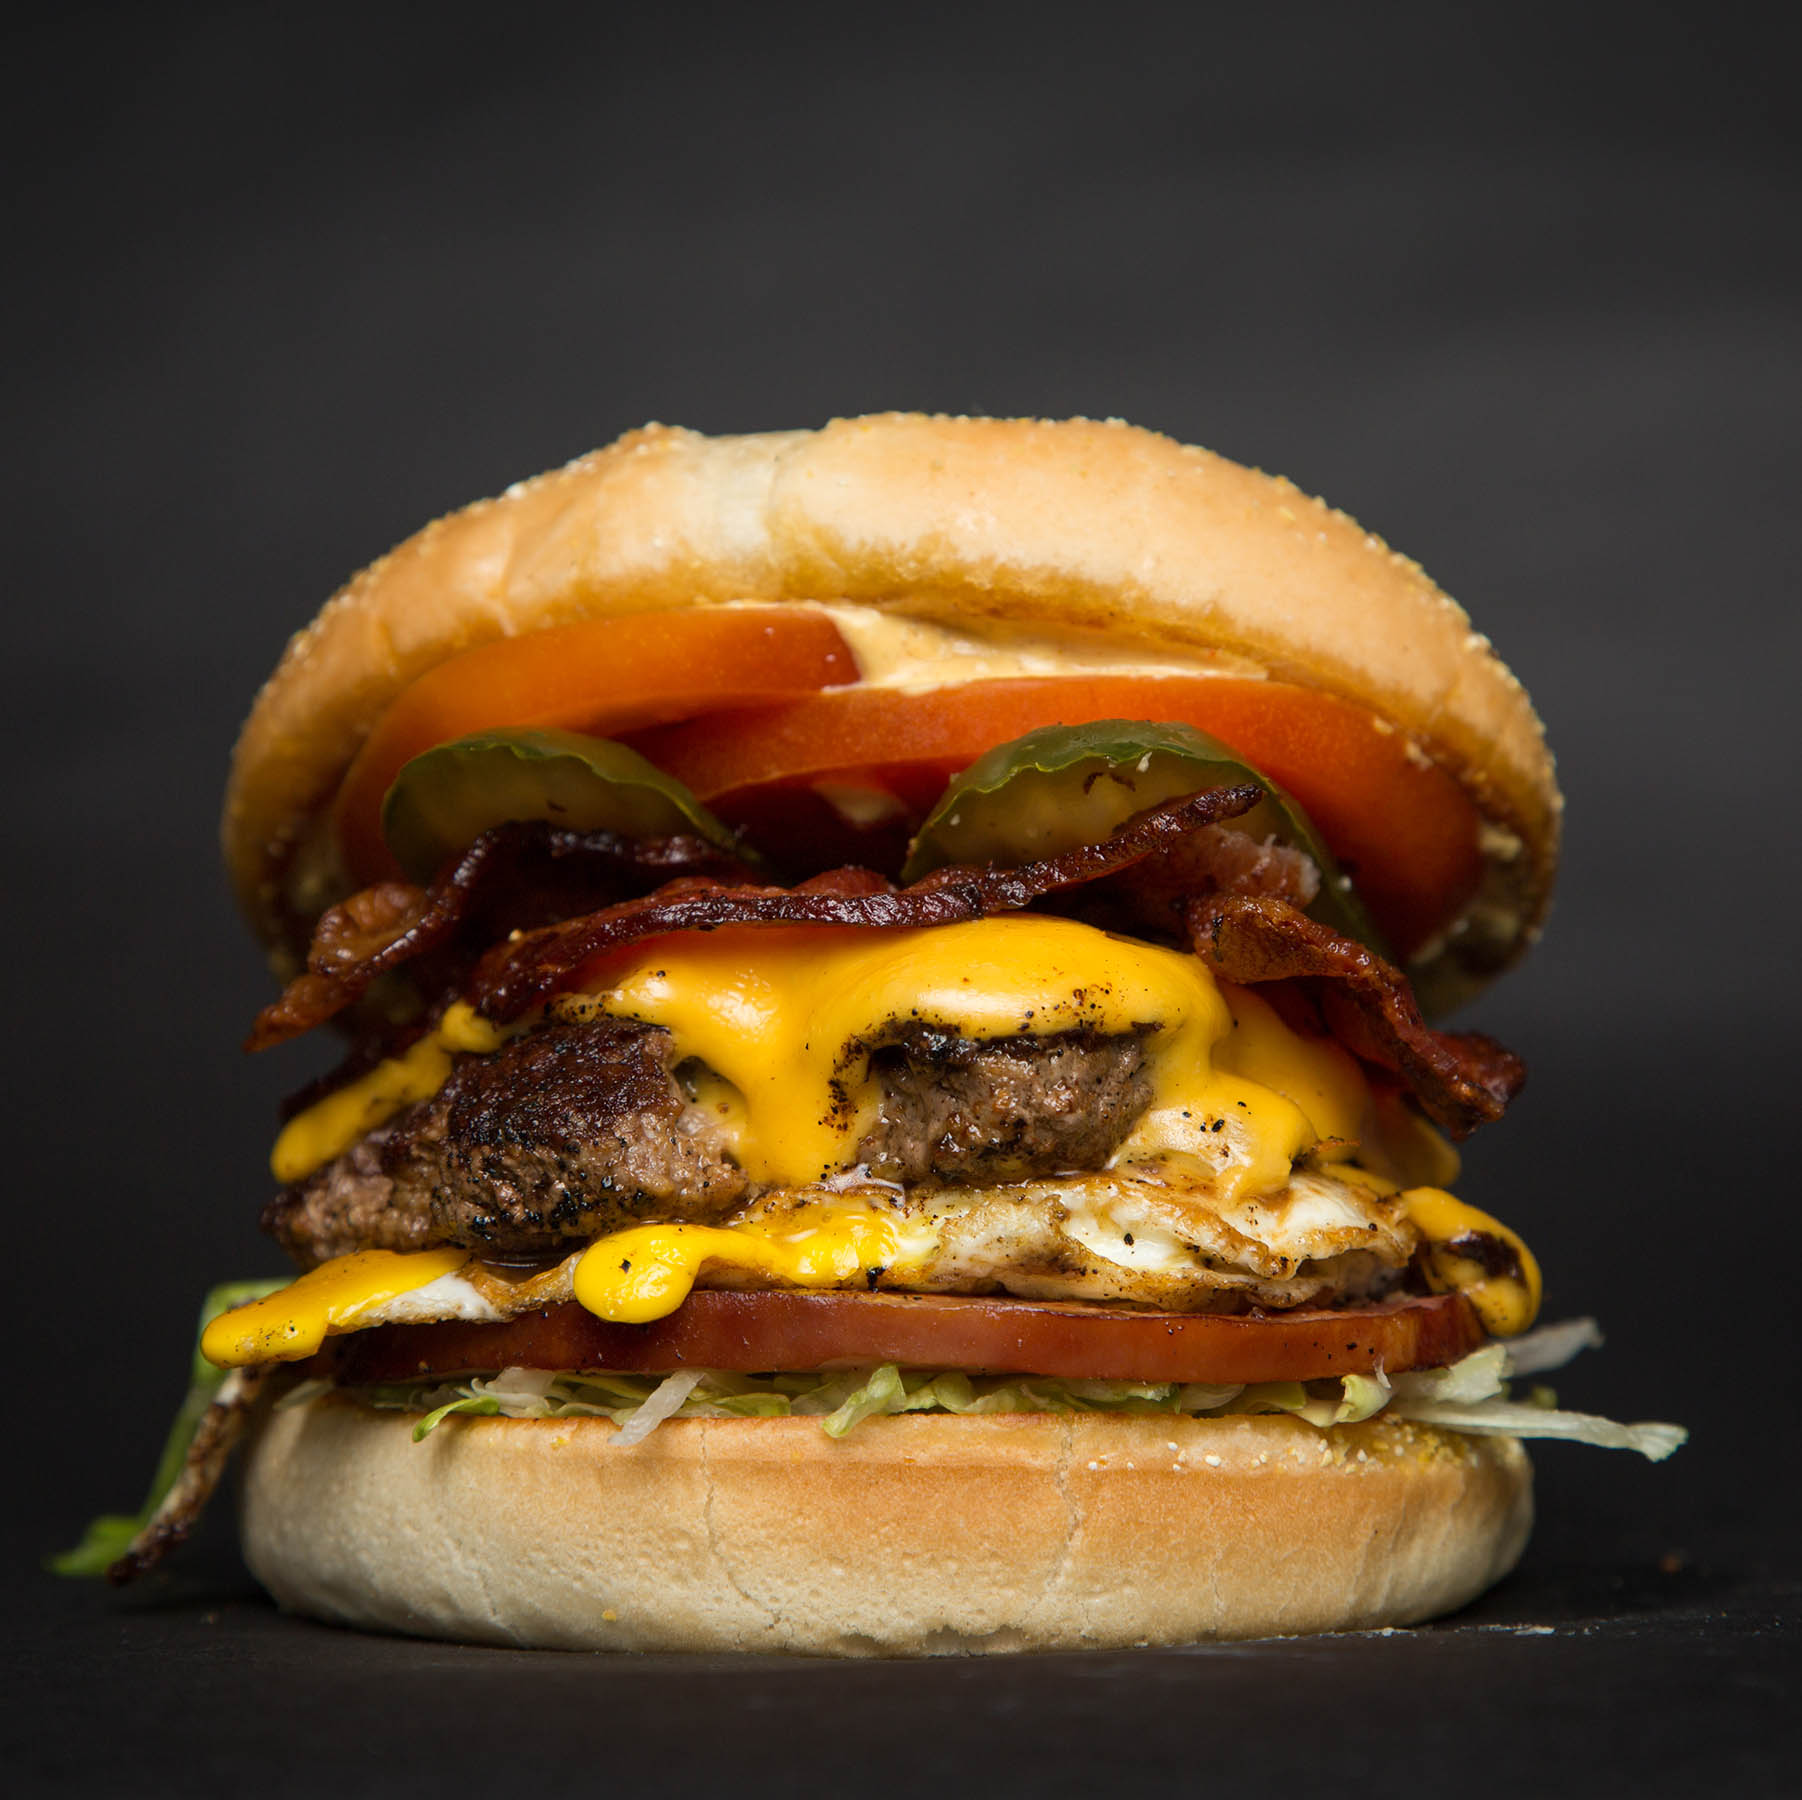 Killer Burger - Service: Search Engine Optimization